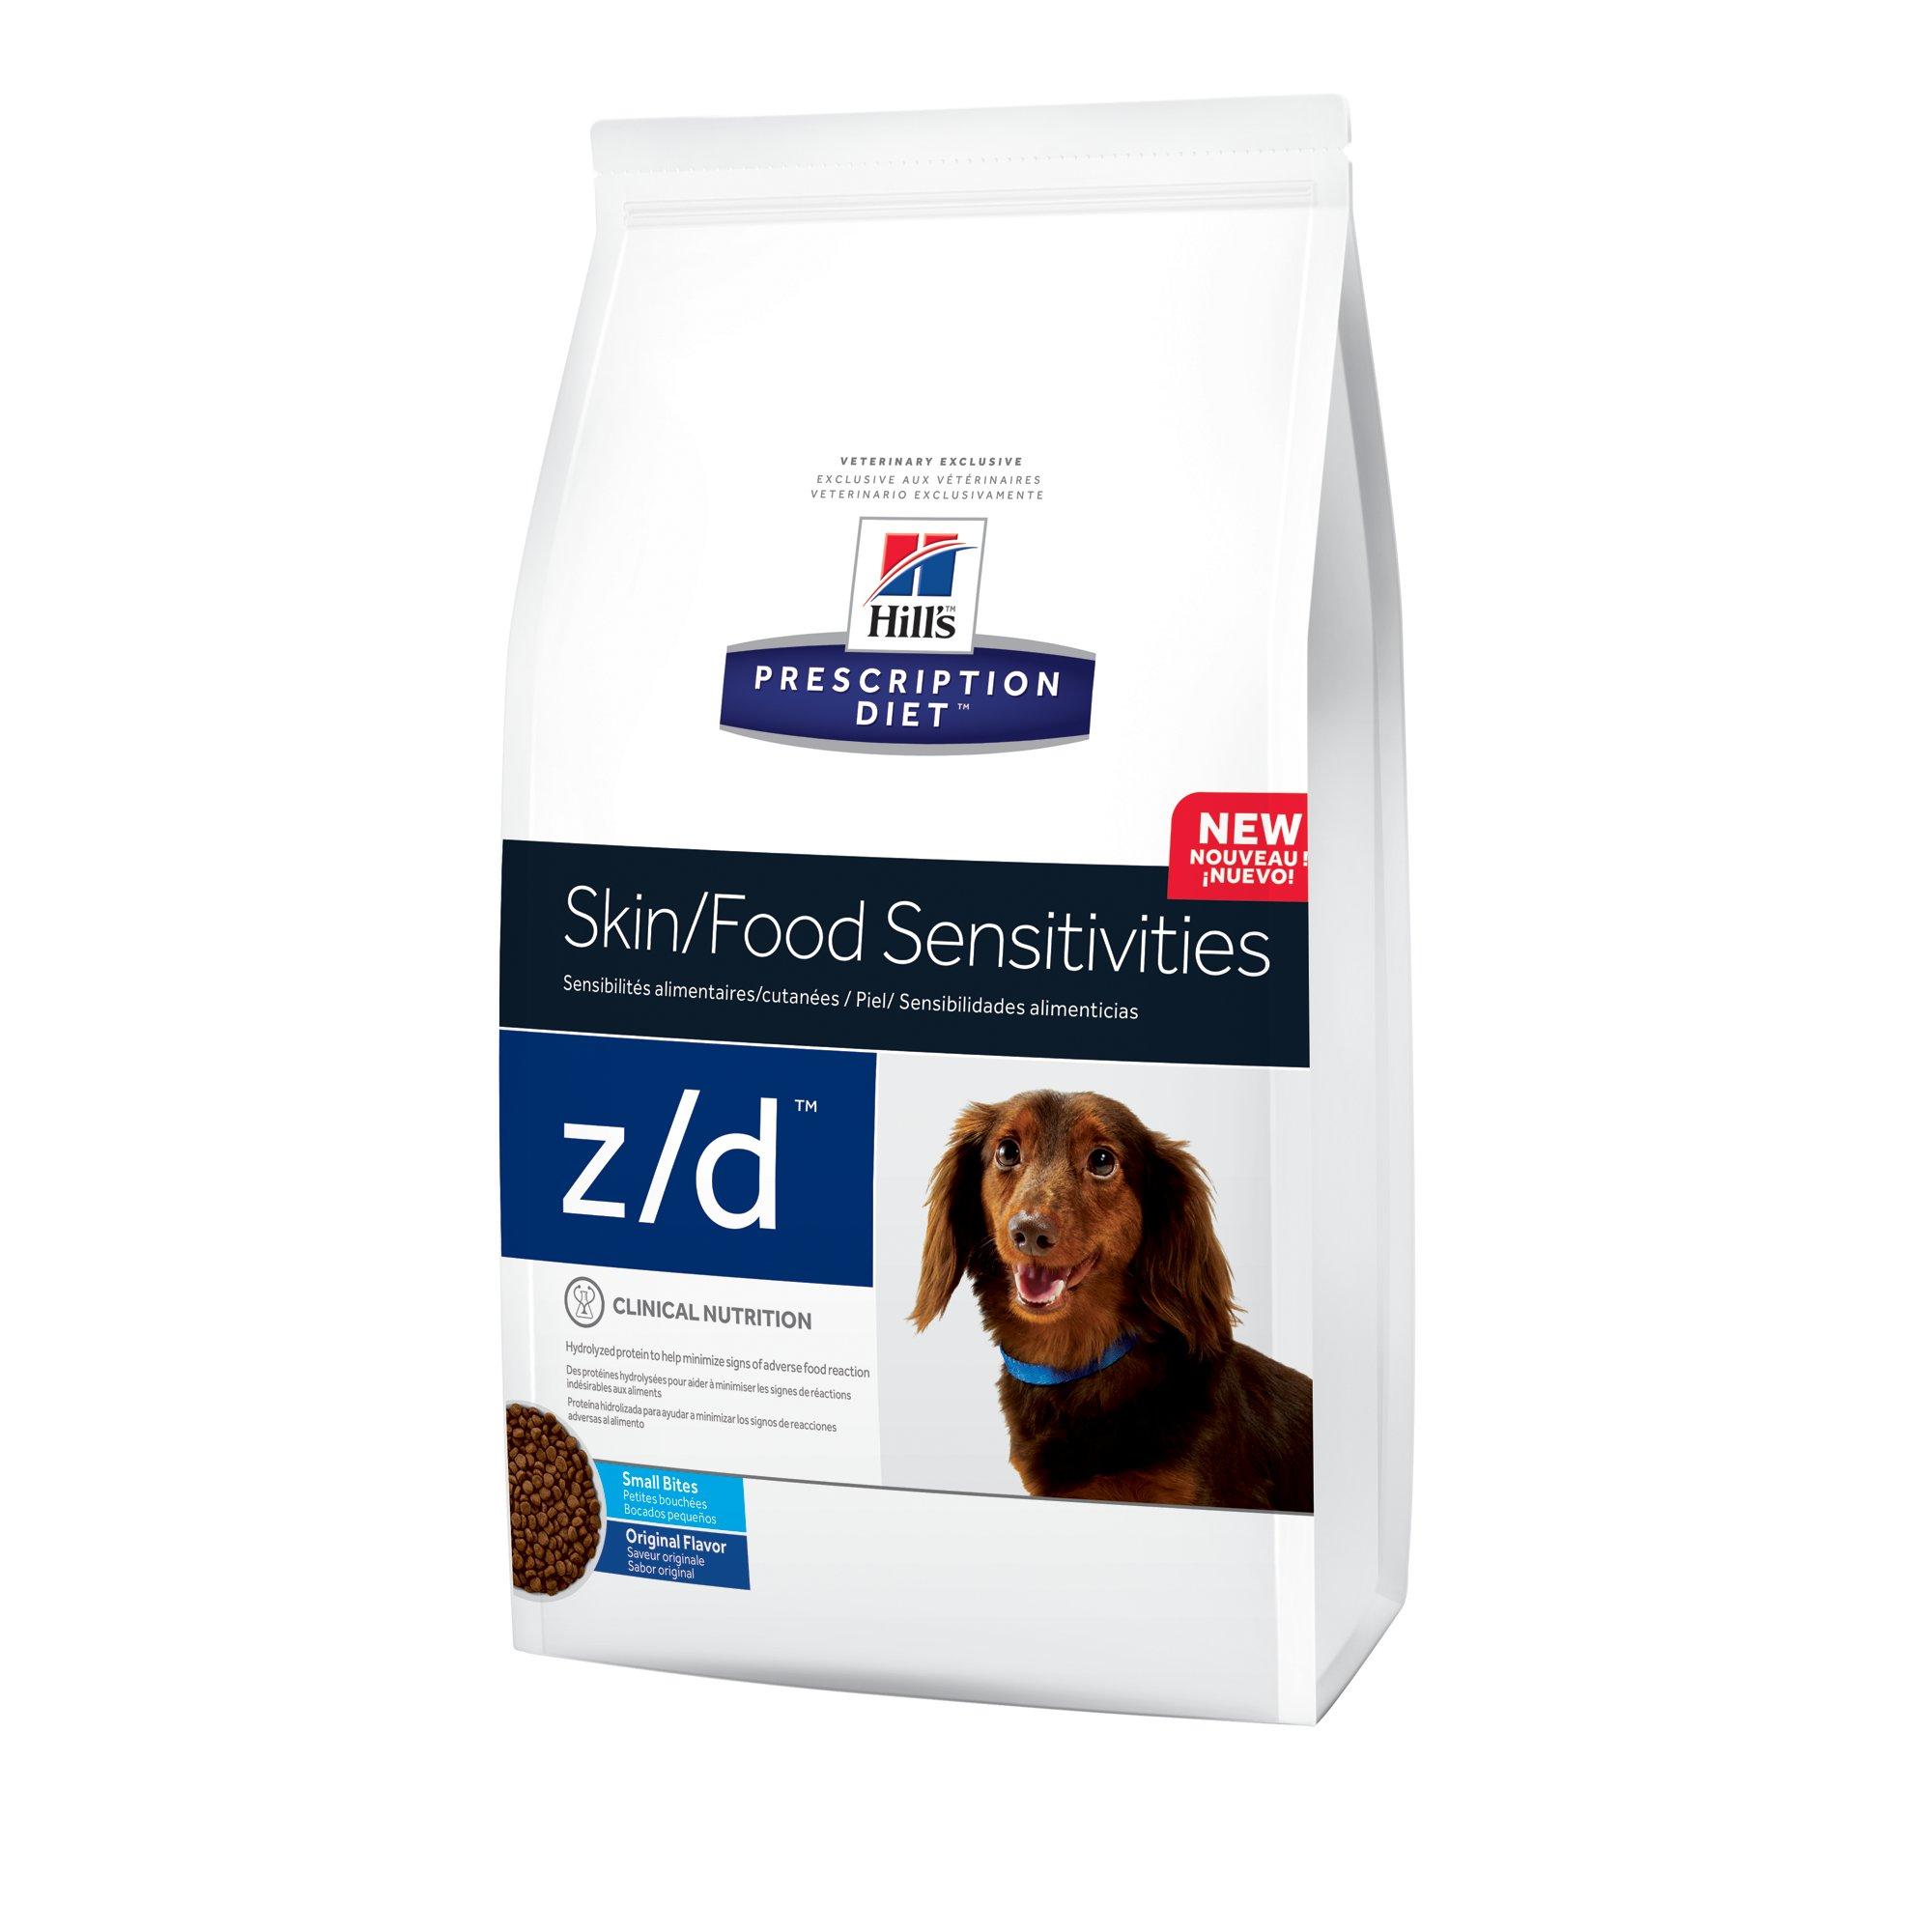 Hills Zd Dry Dog Food